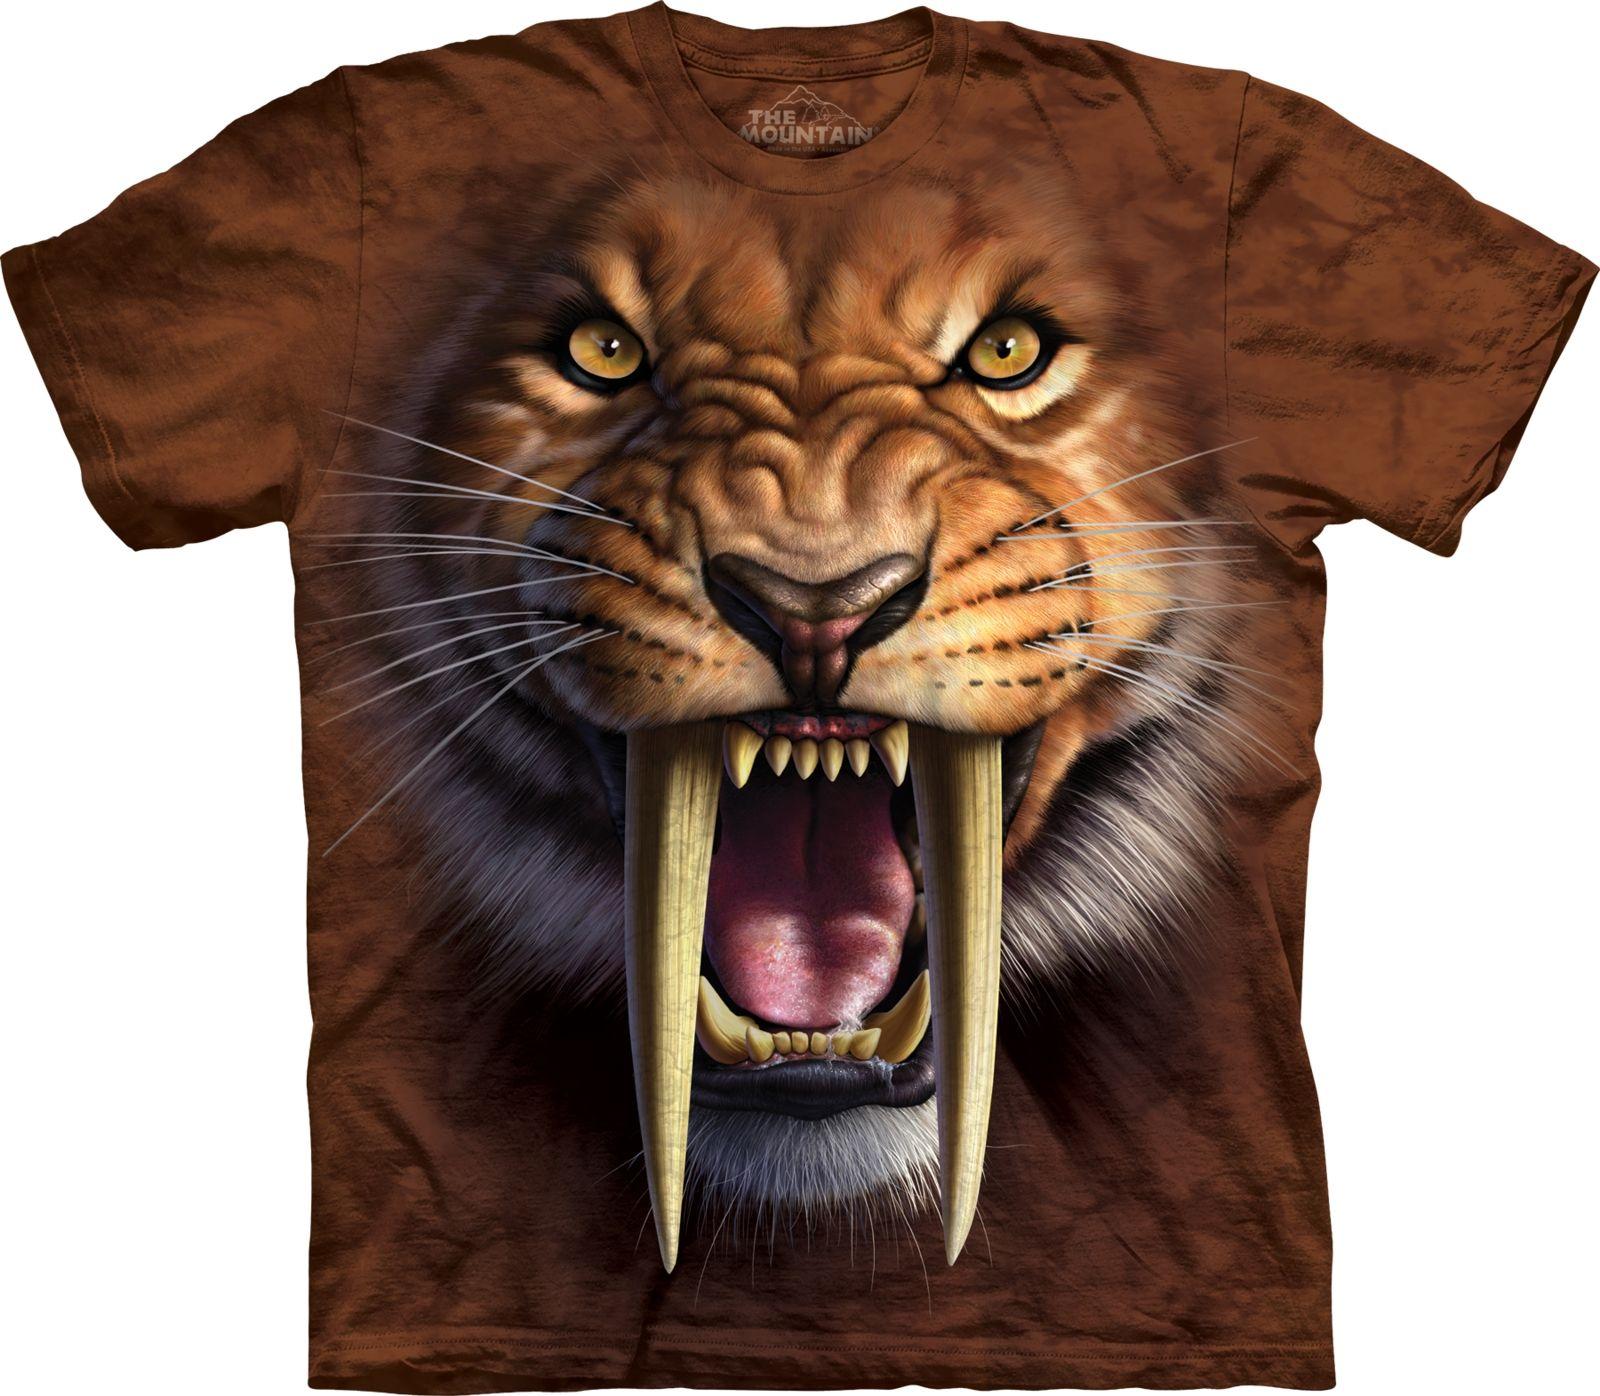 sabertooth-tiger-t-shirt-_2_-15289-p.jpg